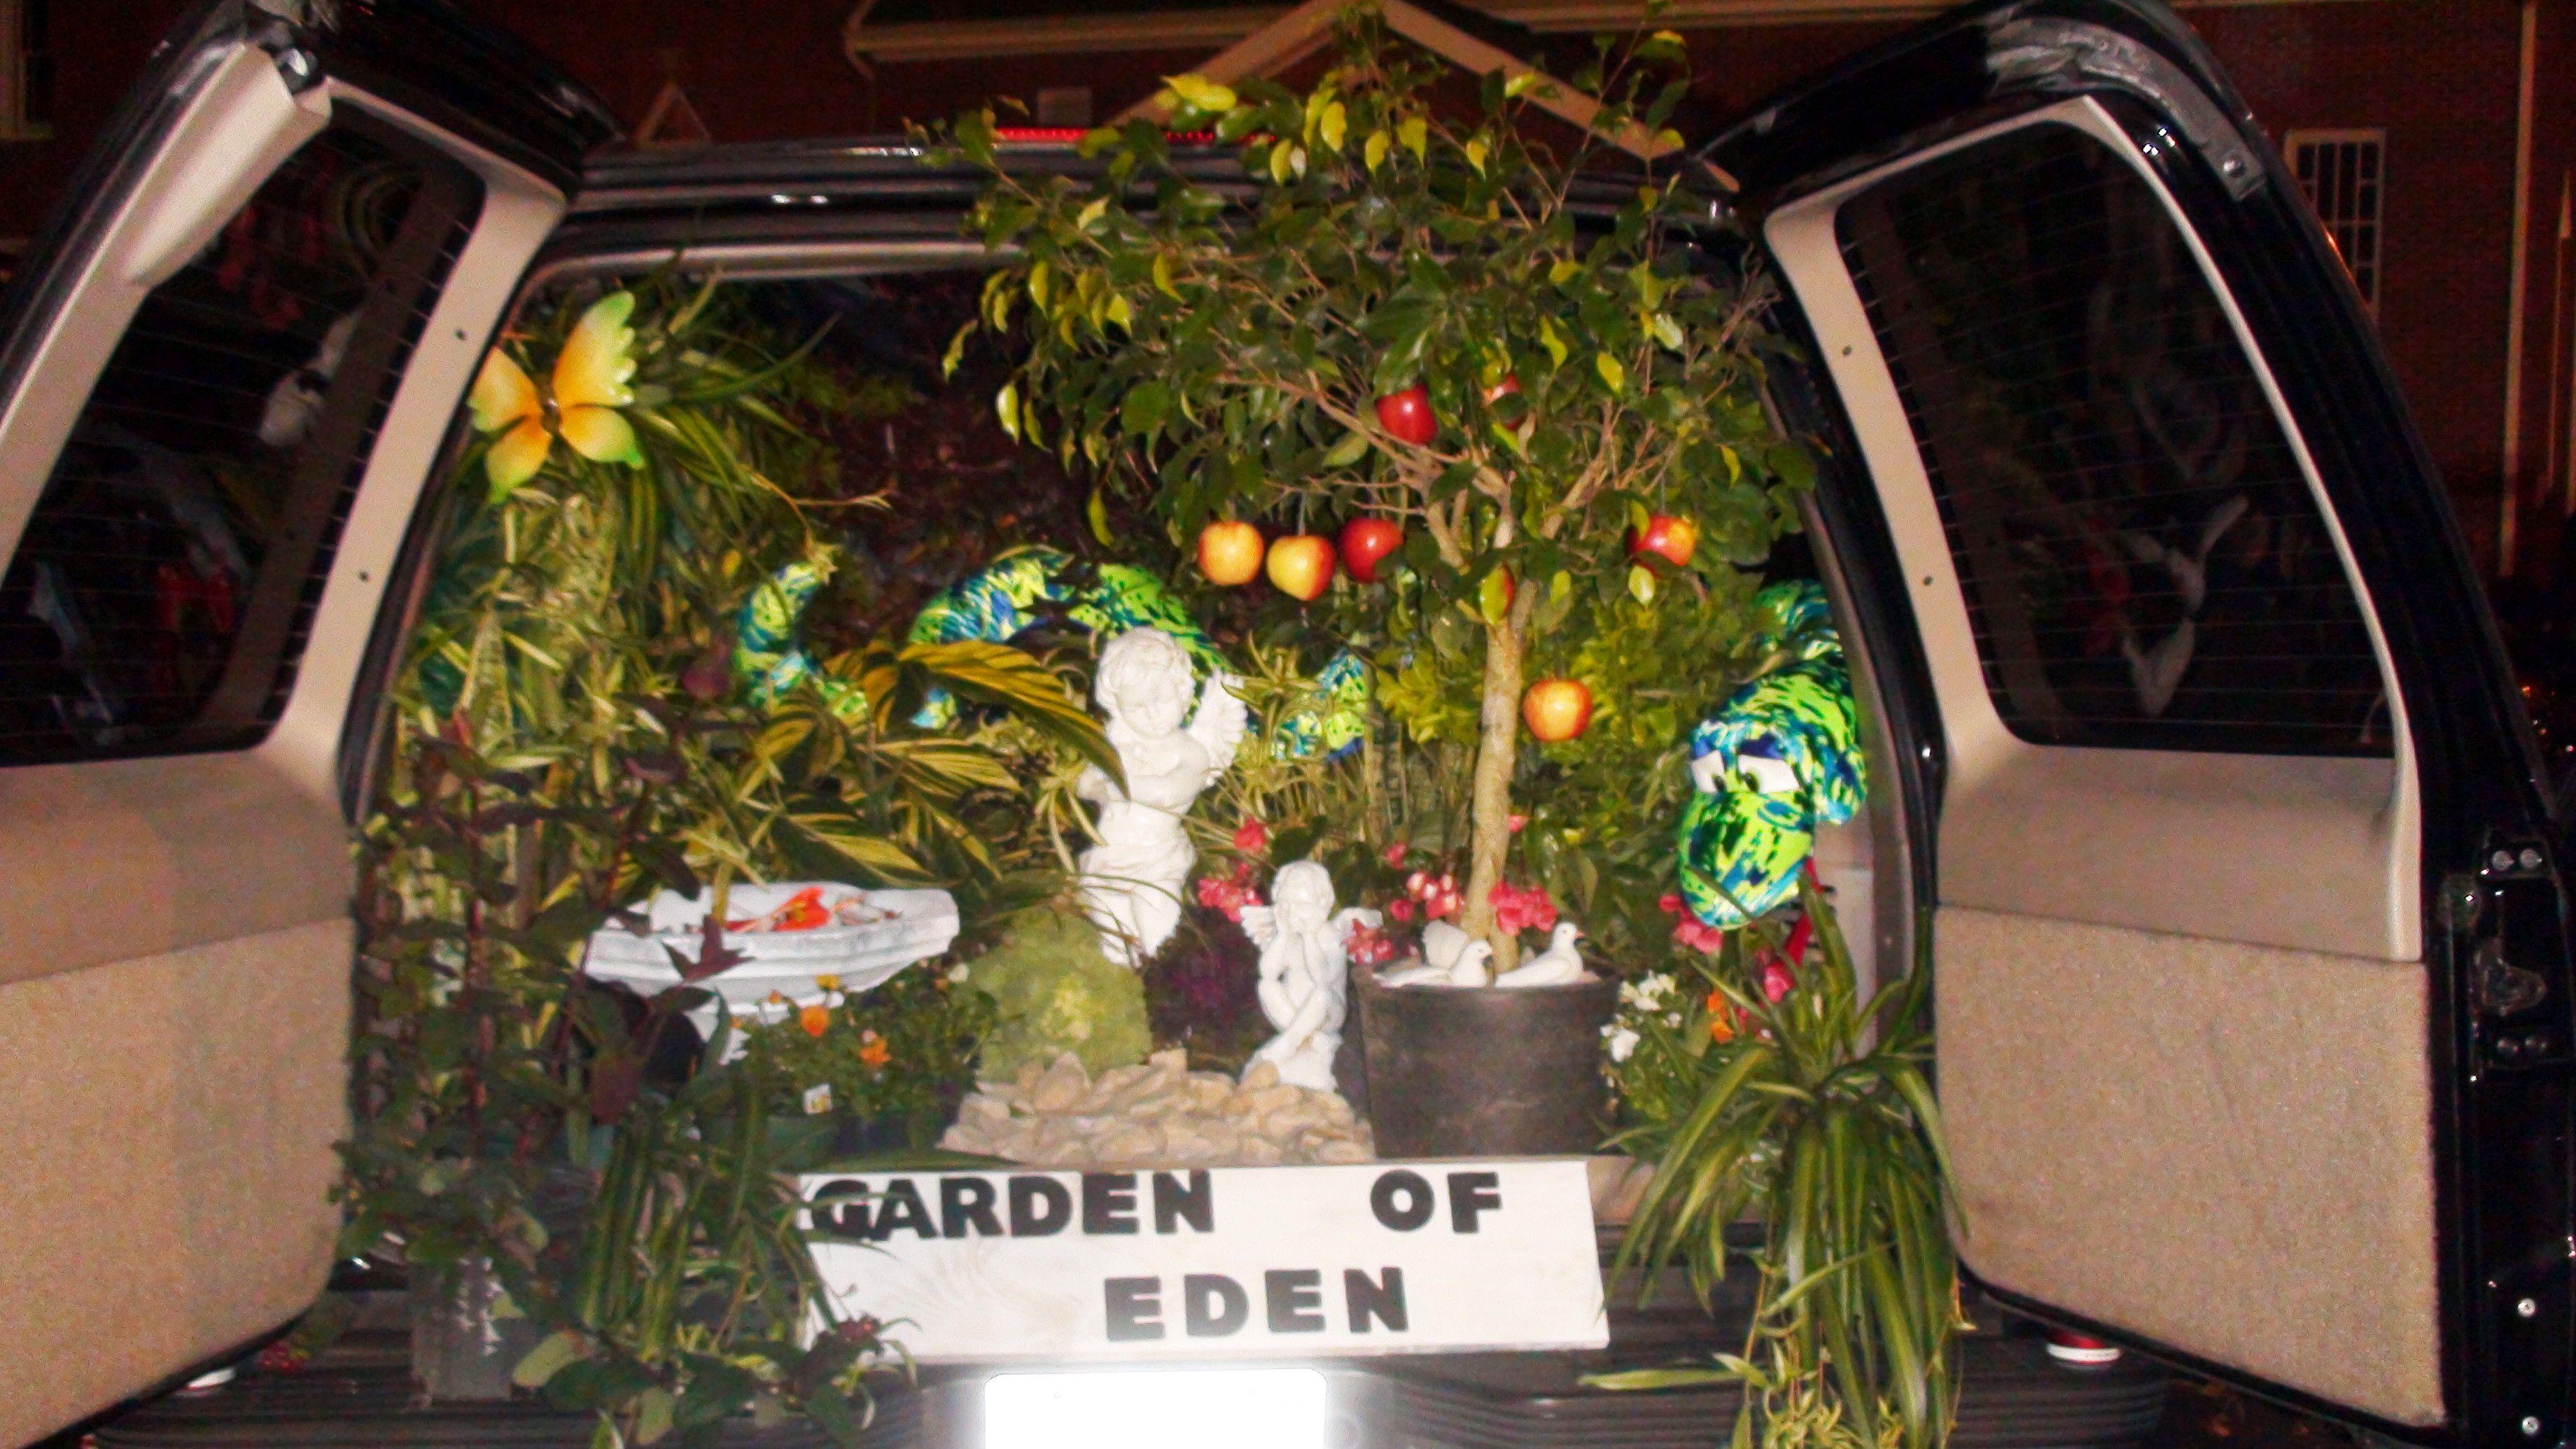 Theme: Garden of Eden, Rocky Hock Baptist Church Trunk or Treat/Fall Festival 2013. #trunkortreatideasforcarsforchurch